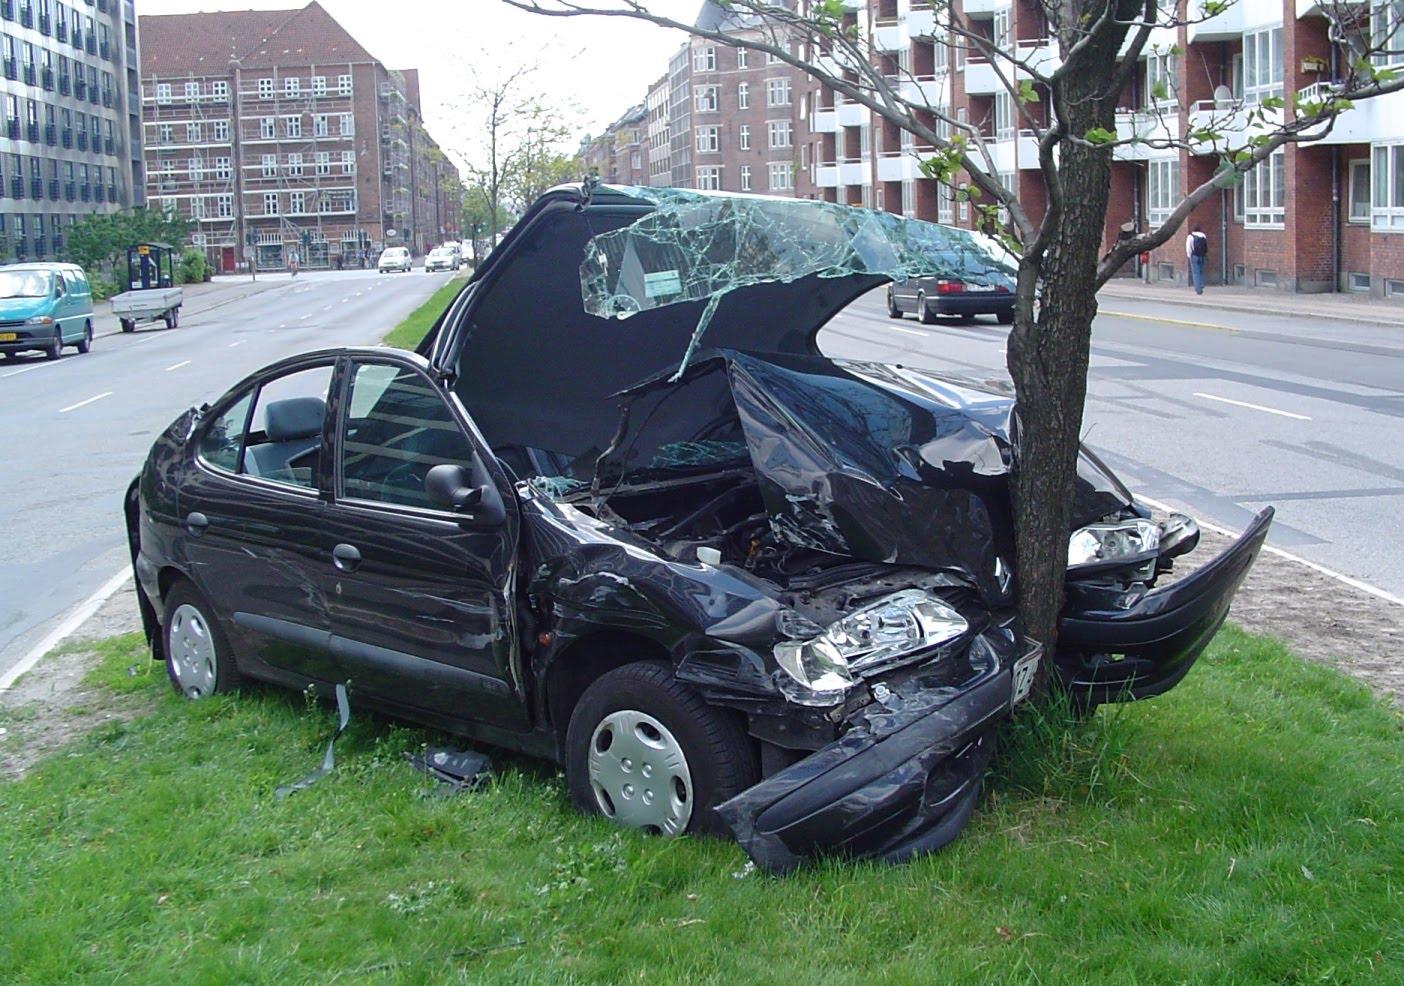 Auto insurance life insurance health insurance free insurance auto